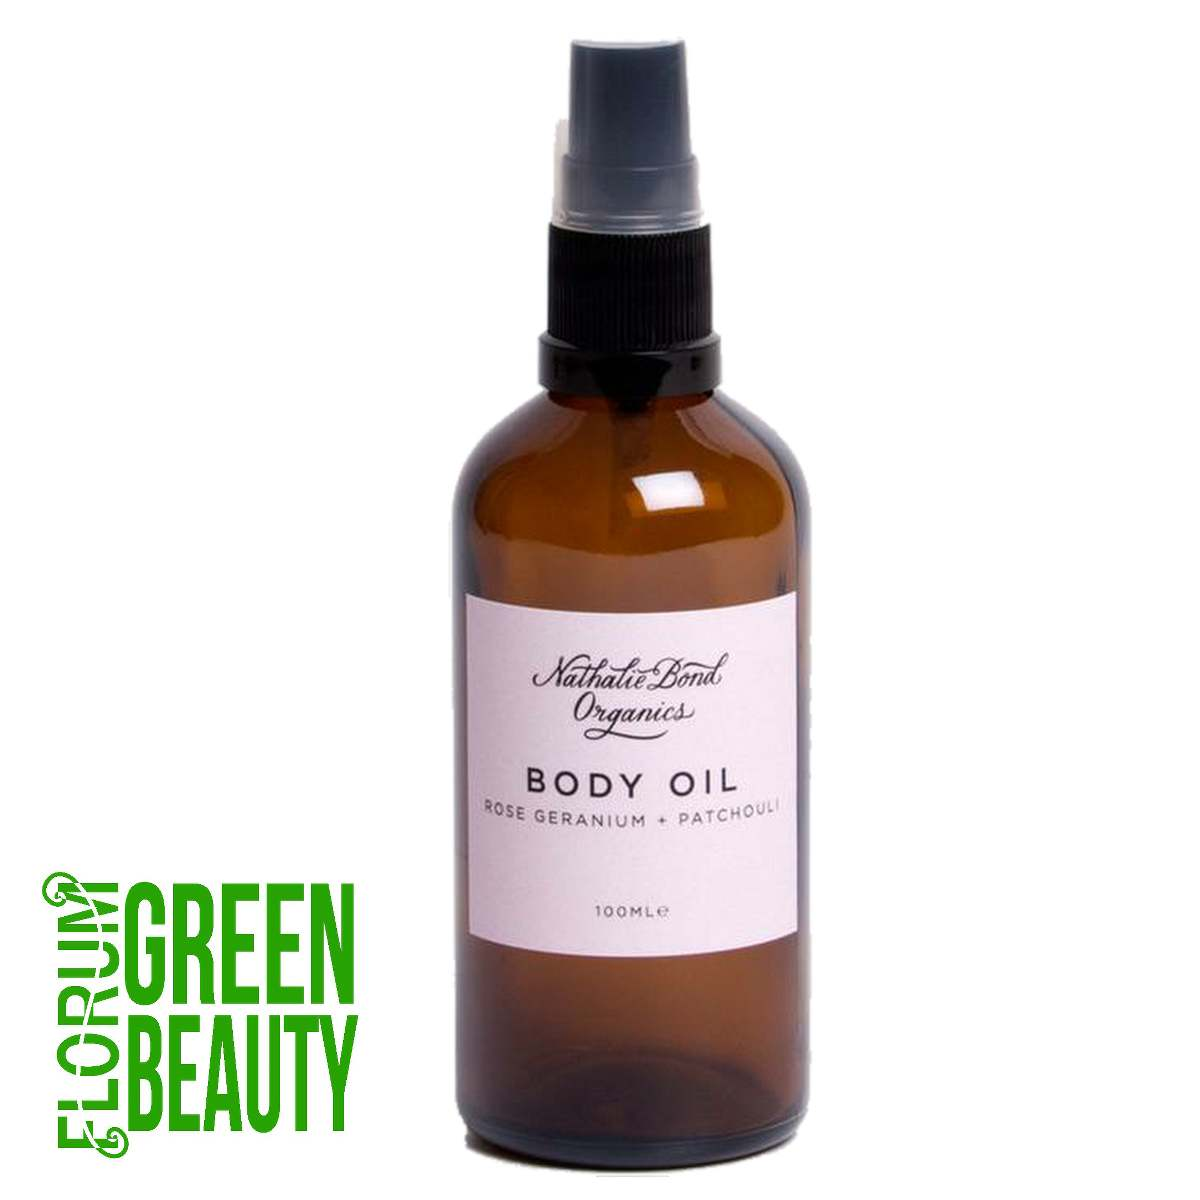 Nathalie Bond Organics (UK) - Rose Geranium &Patchouli Body Oil